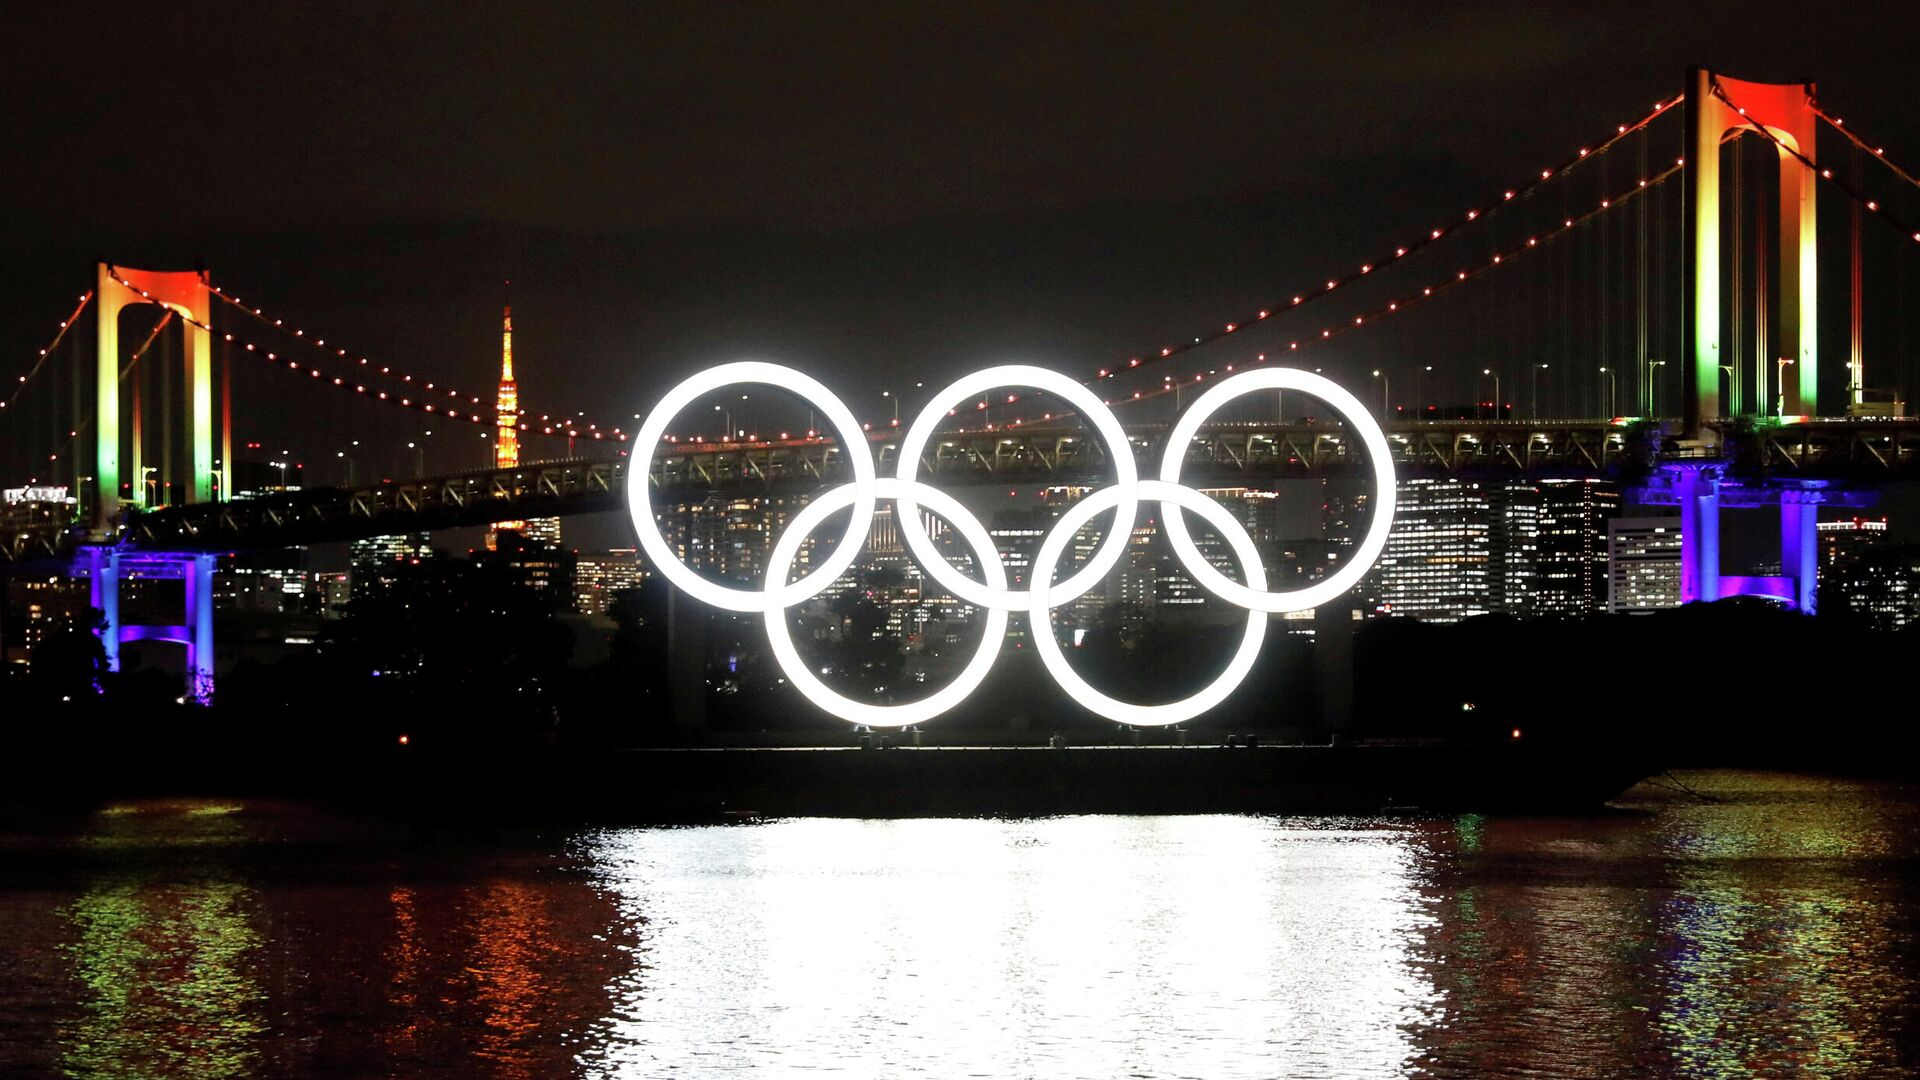 Олимпийские кольца в Токио - РИА Новости, 1920, 17.01.2021